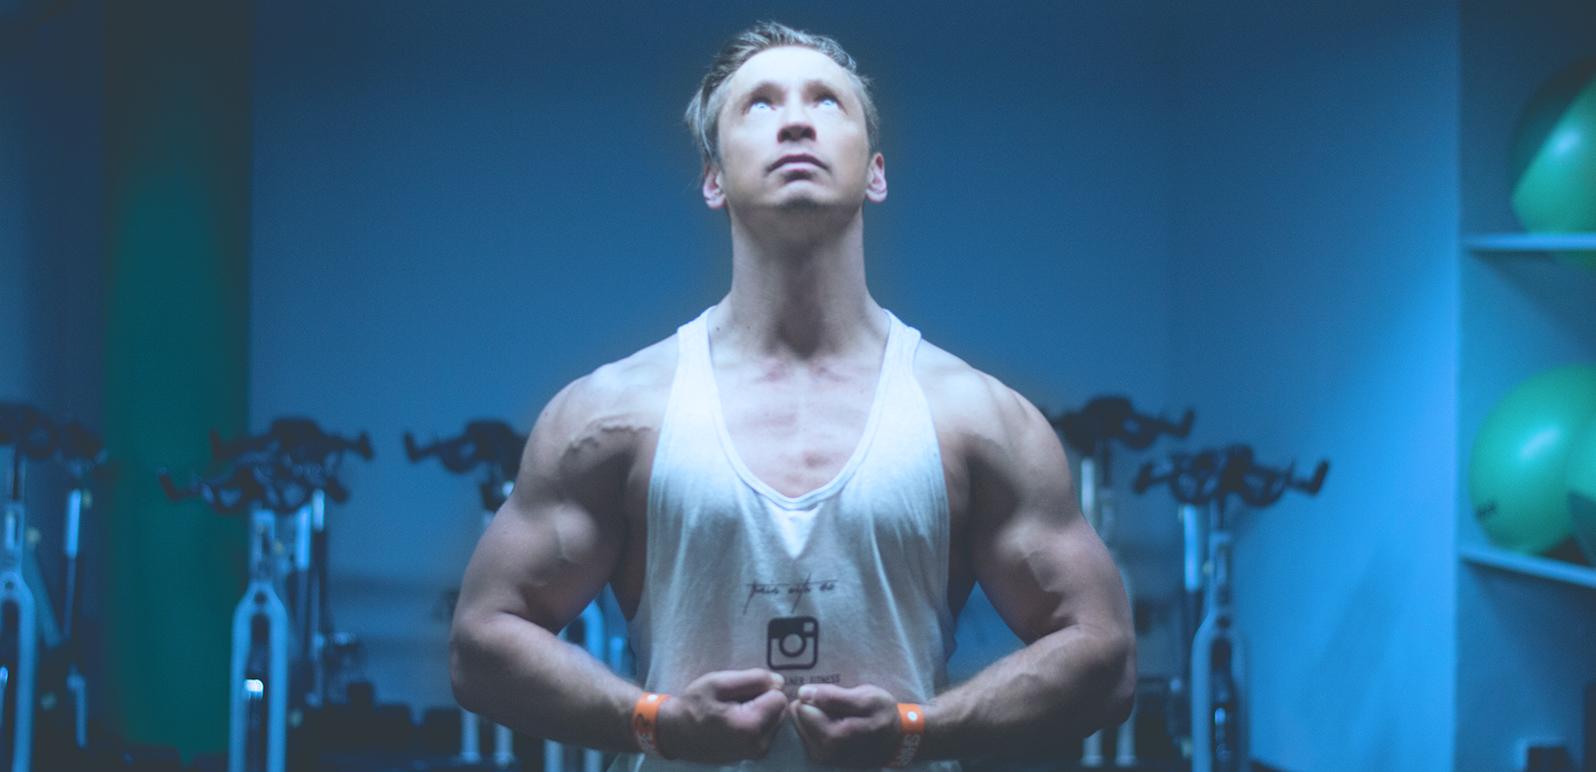 Karl Wallner Fitness